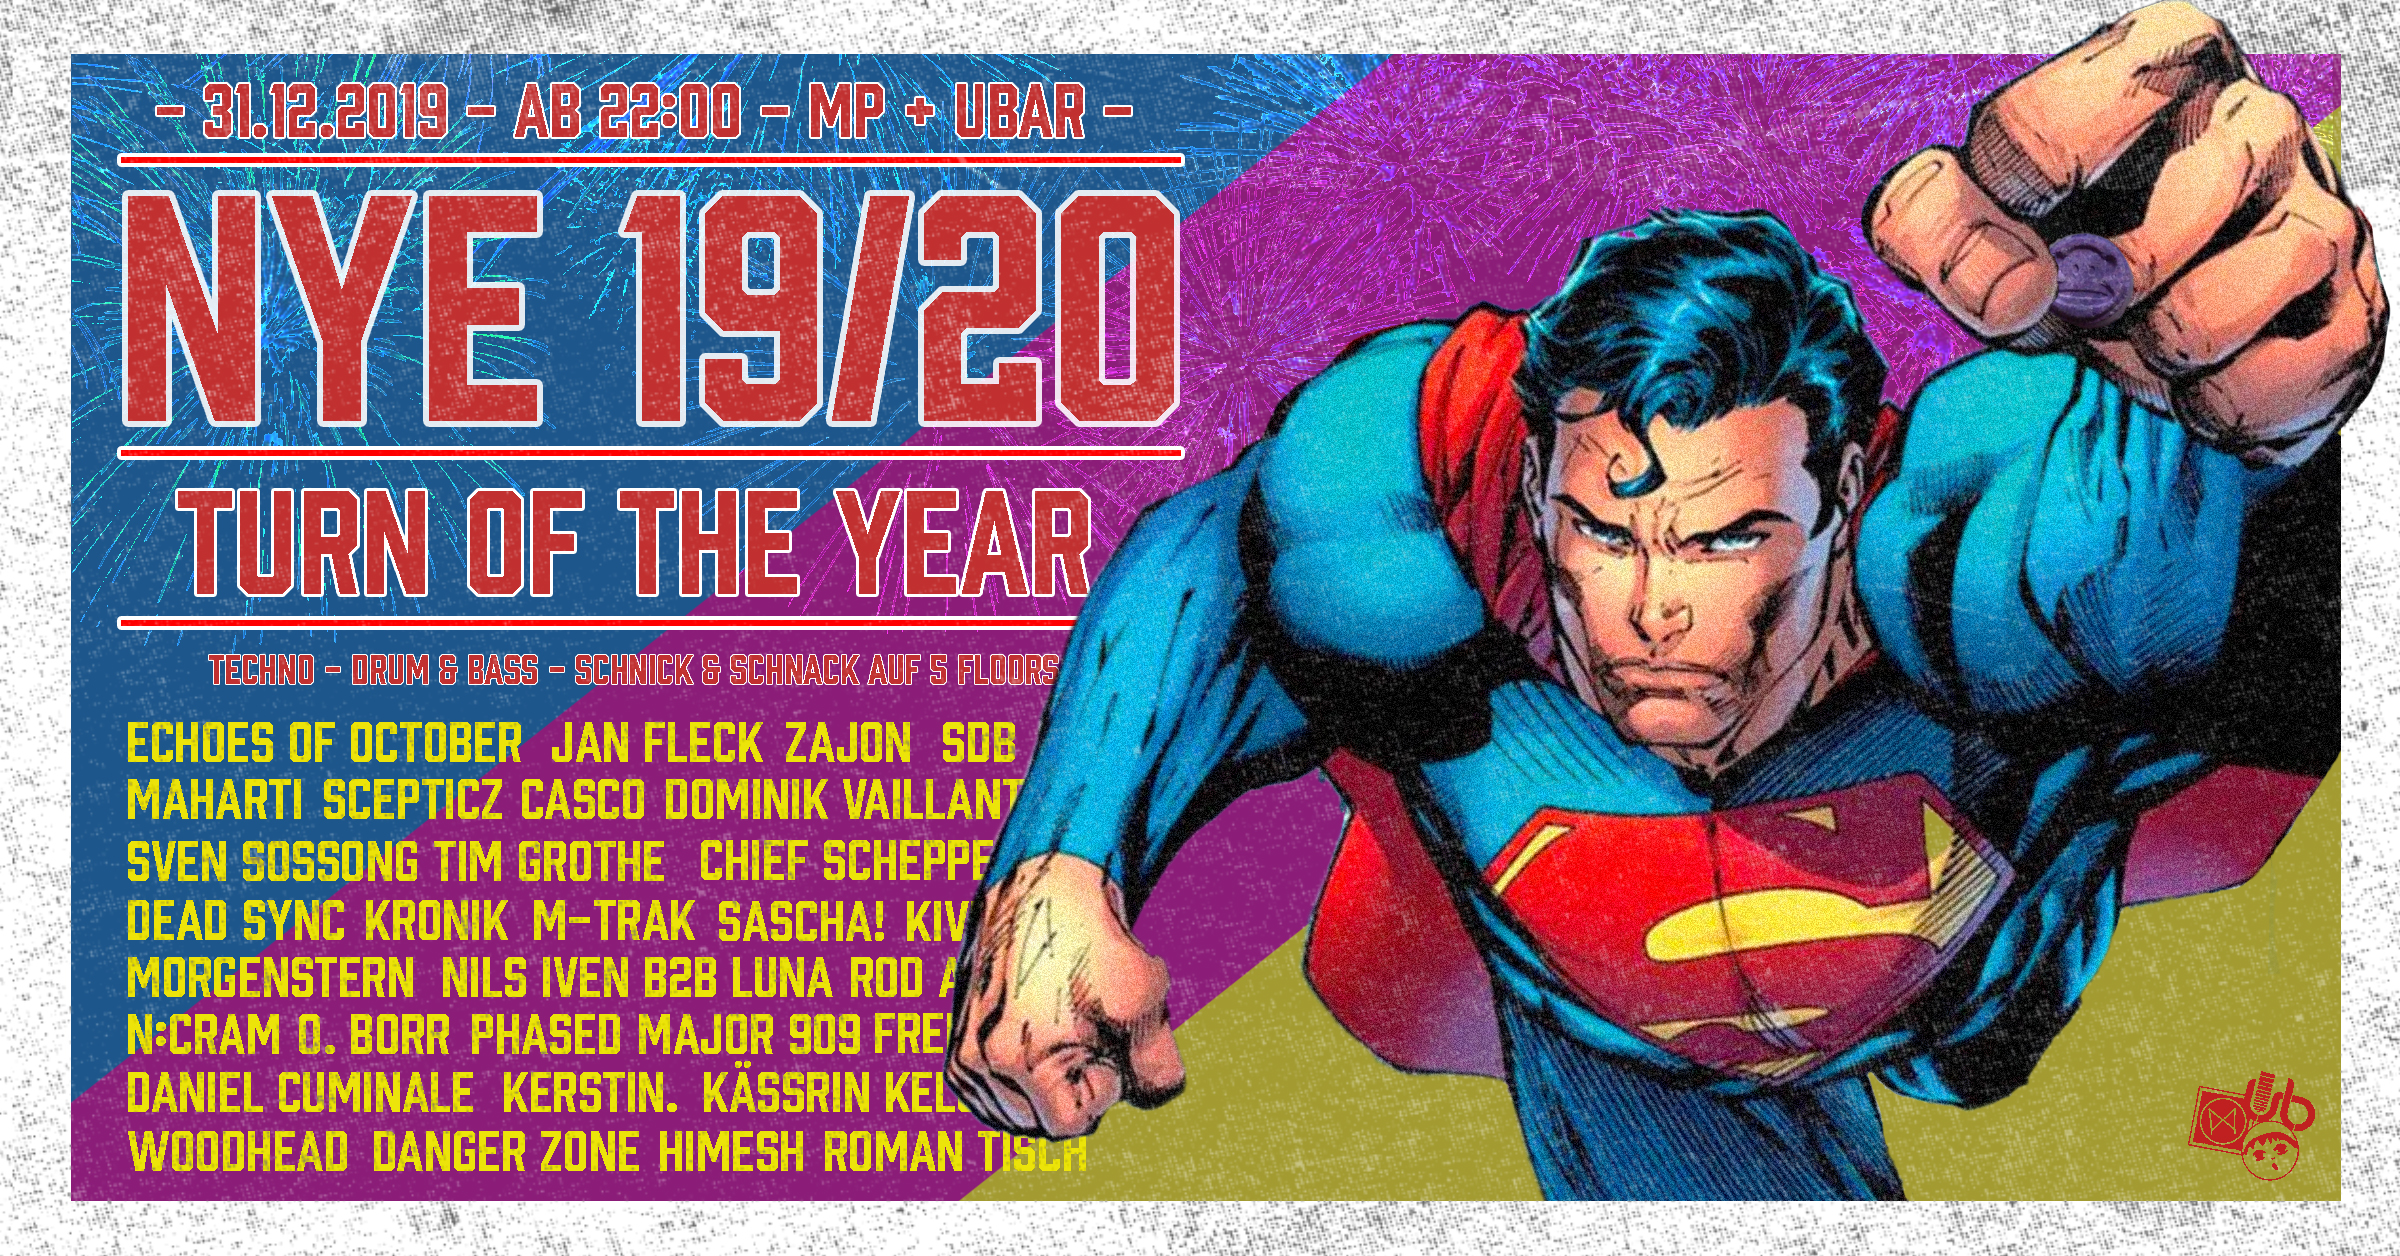 NYE 19/20 - The Turn of the Year!